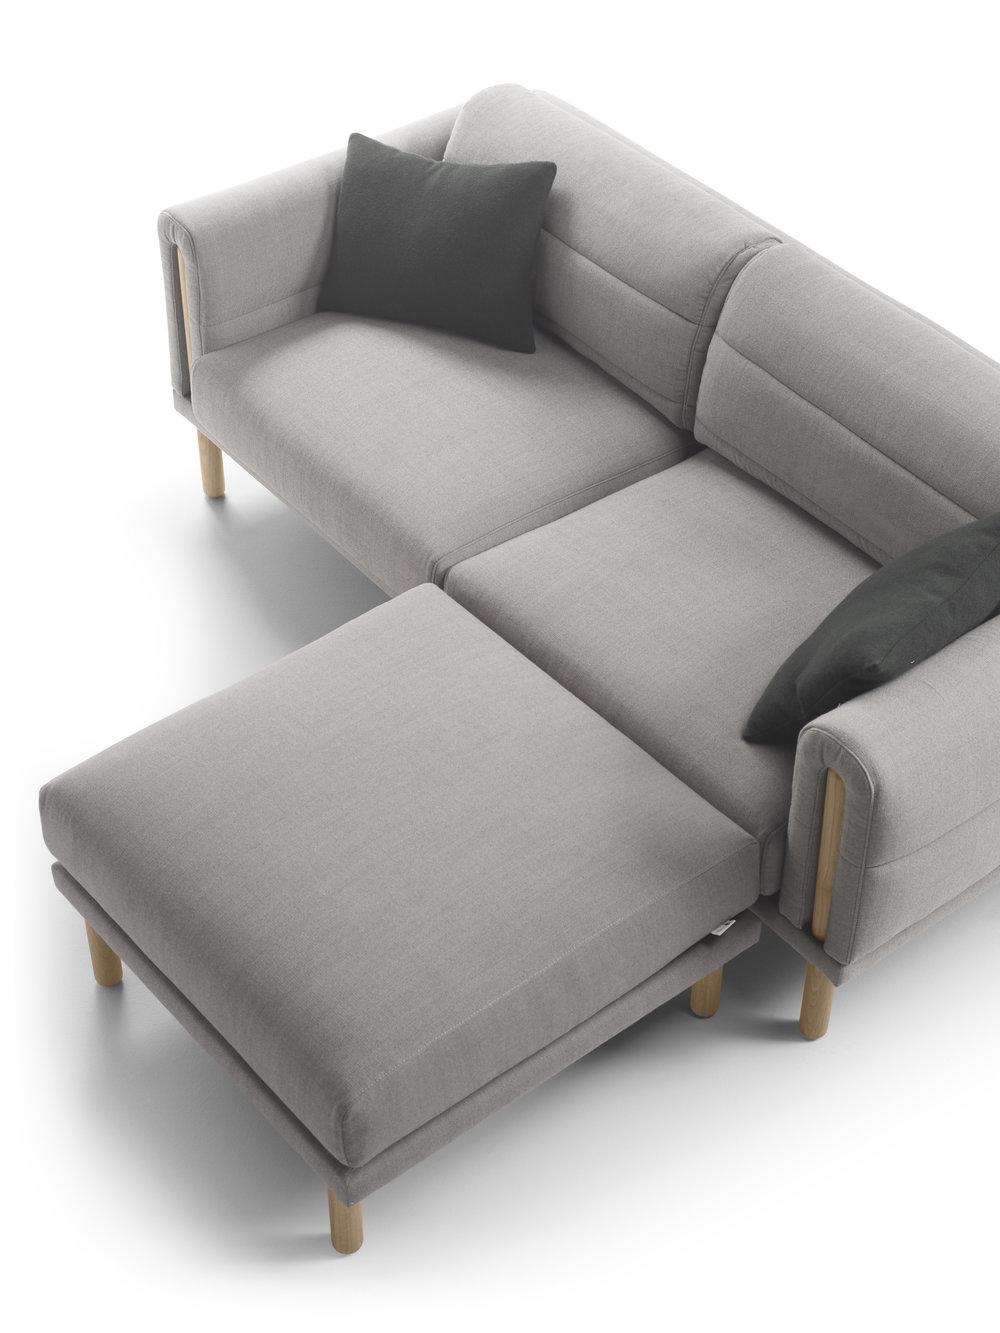 Abric sofa-Silvia Ceñal-Bosc-4